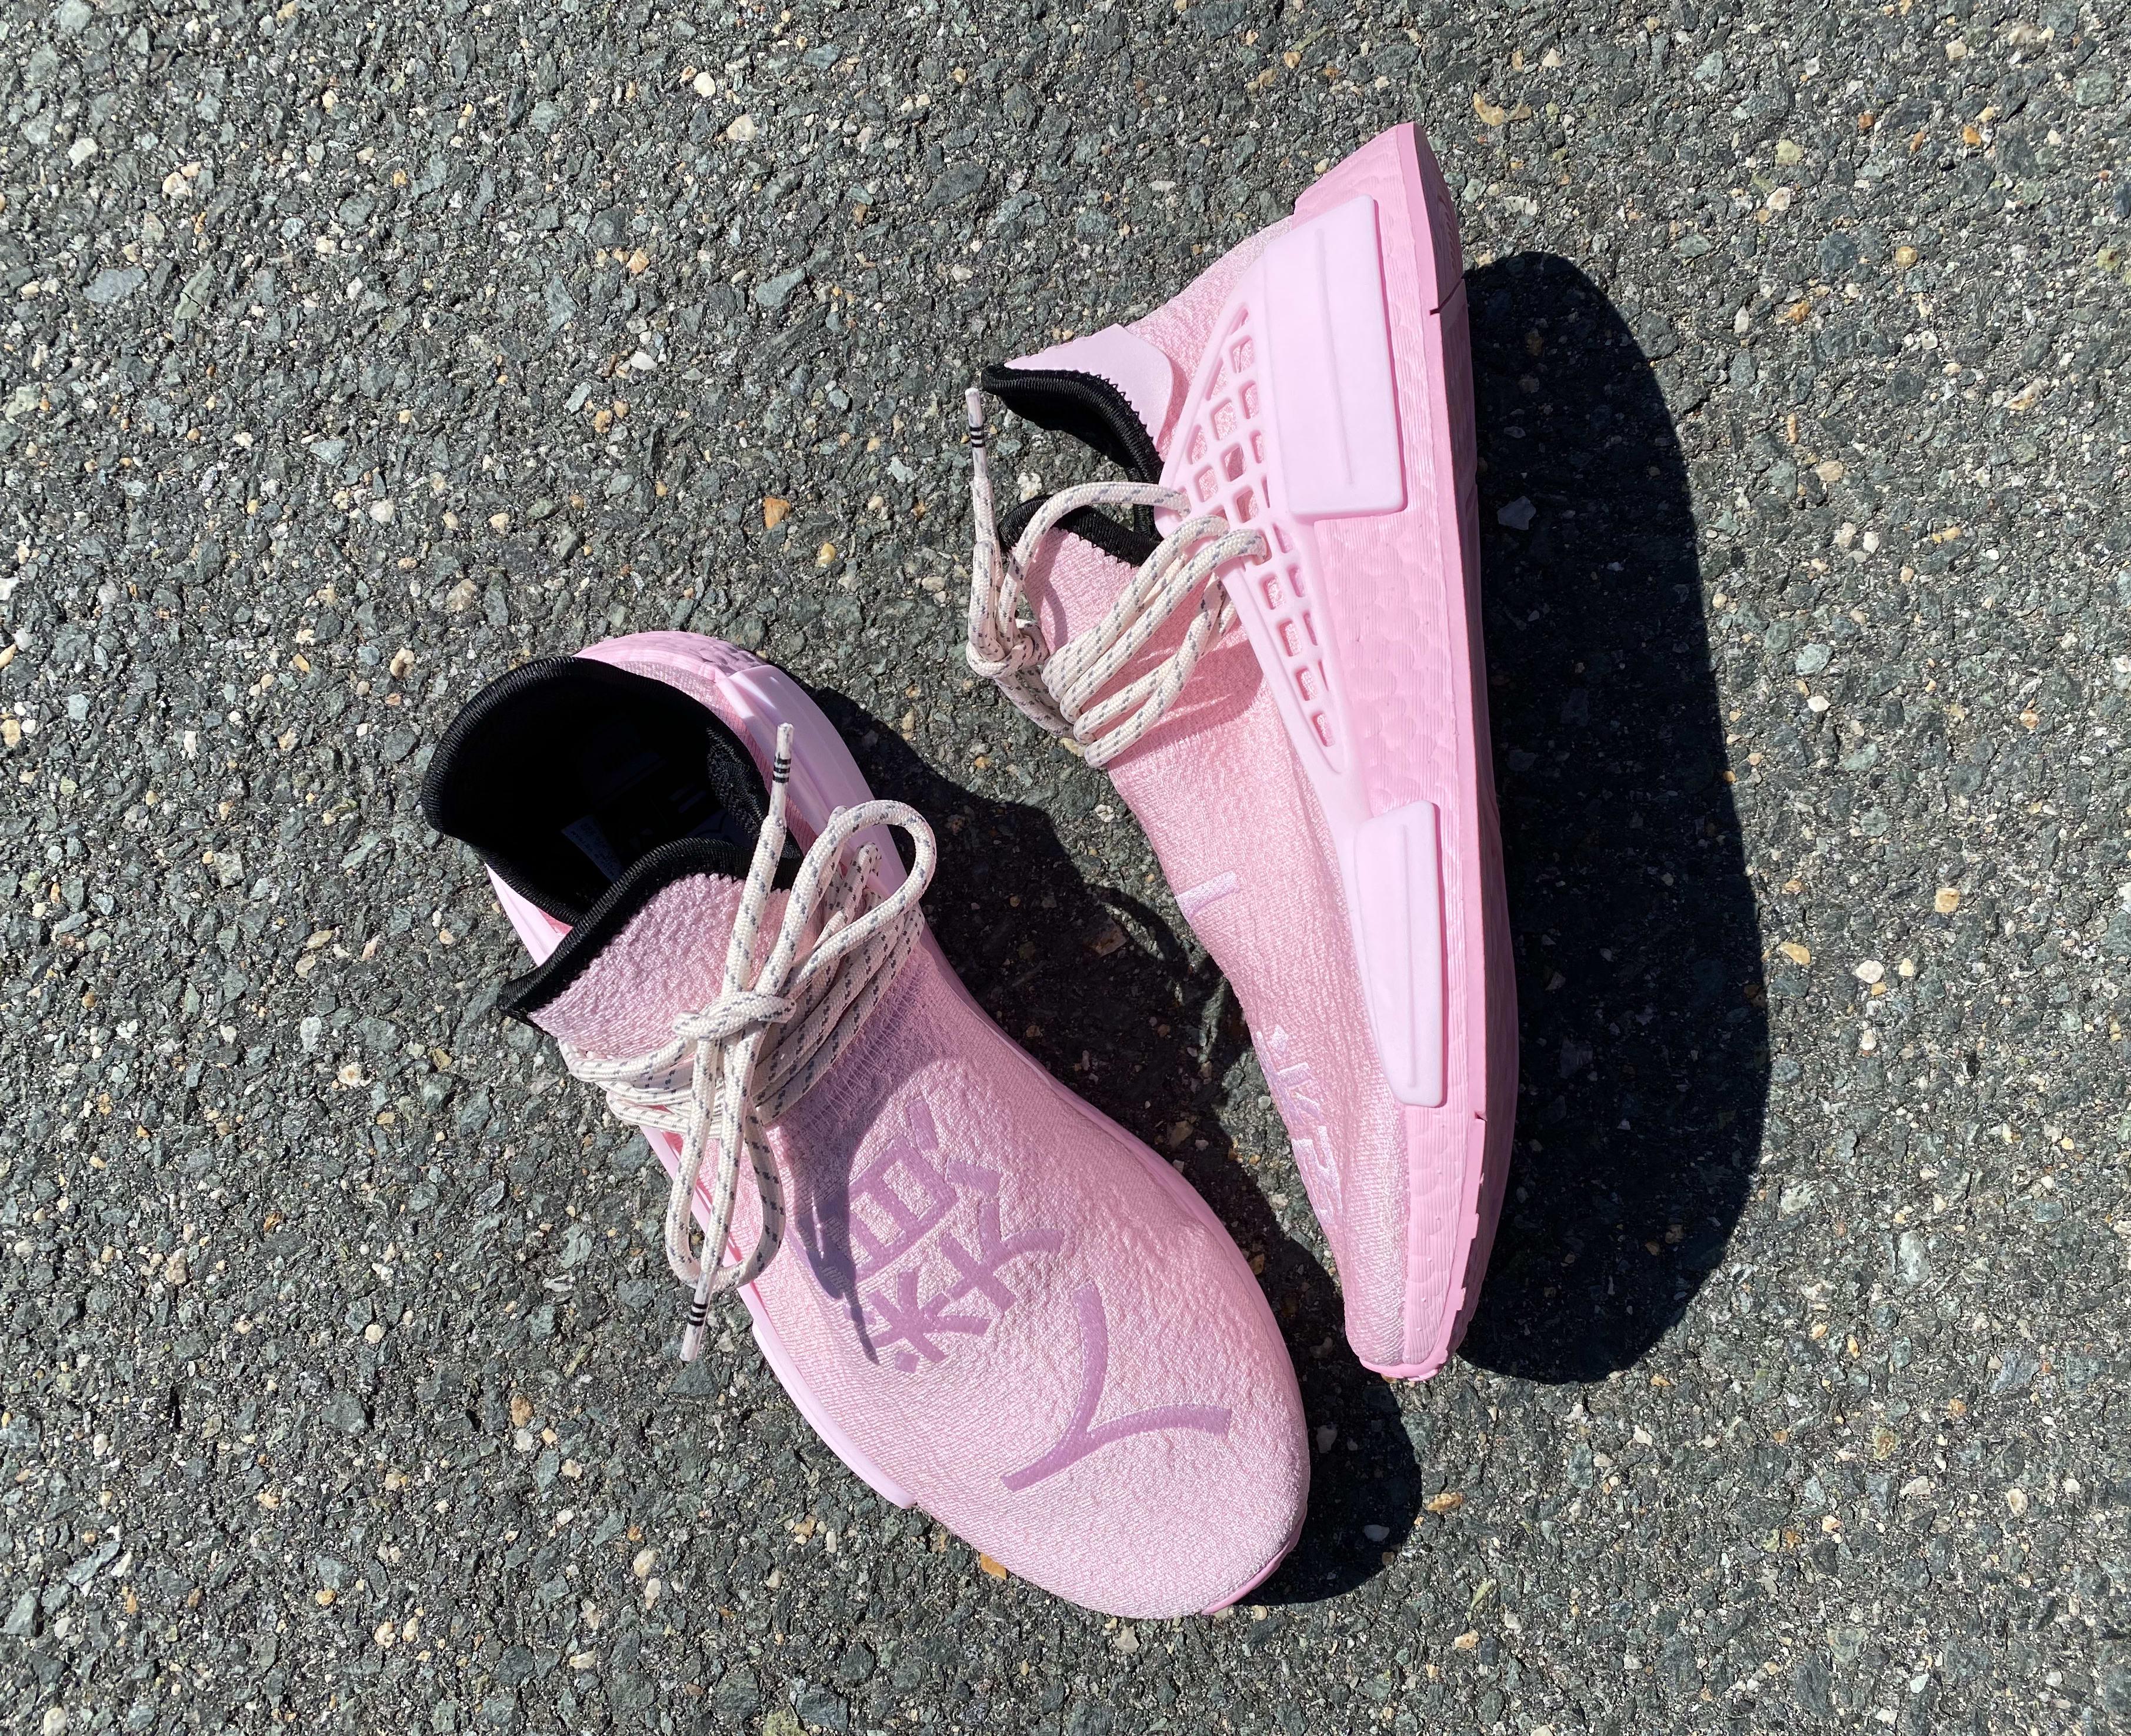 Pharrell x Adidas NMD Hu 'Pink' GY0088 Top